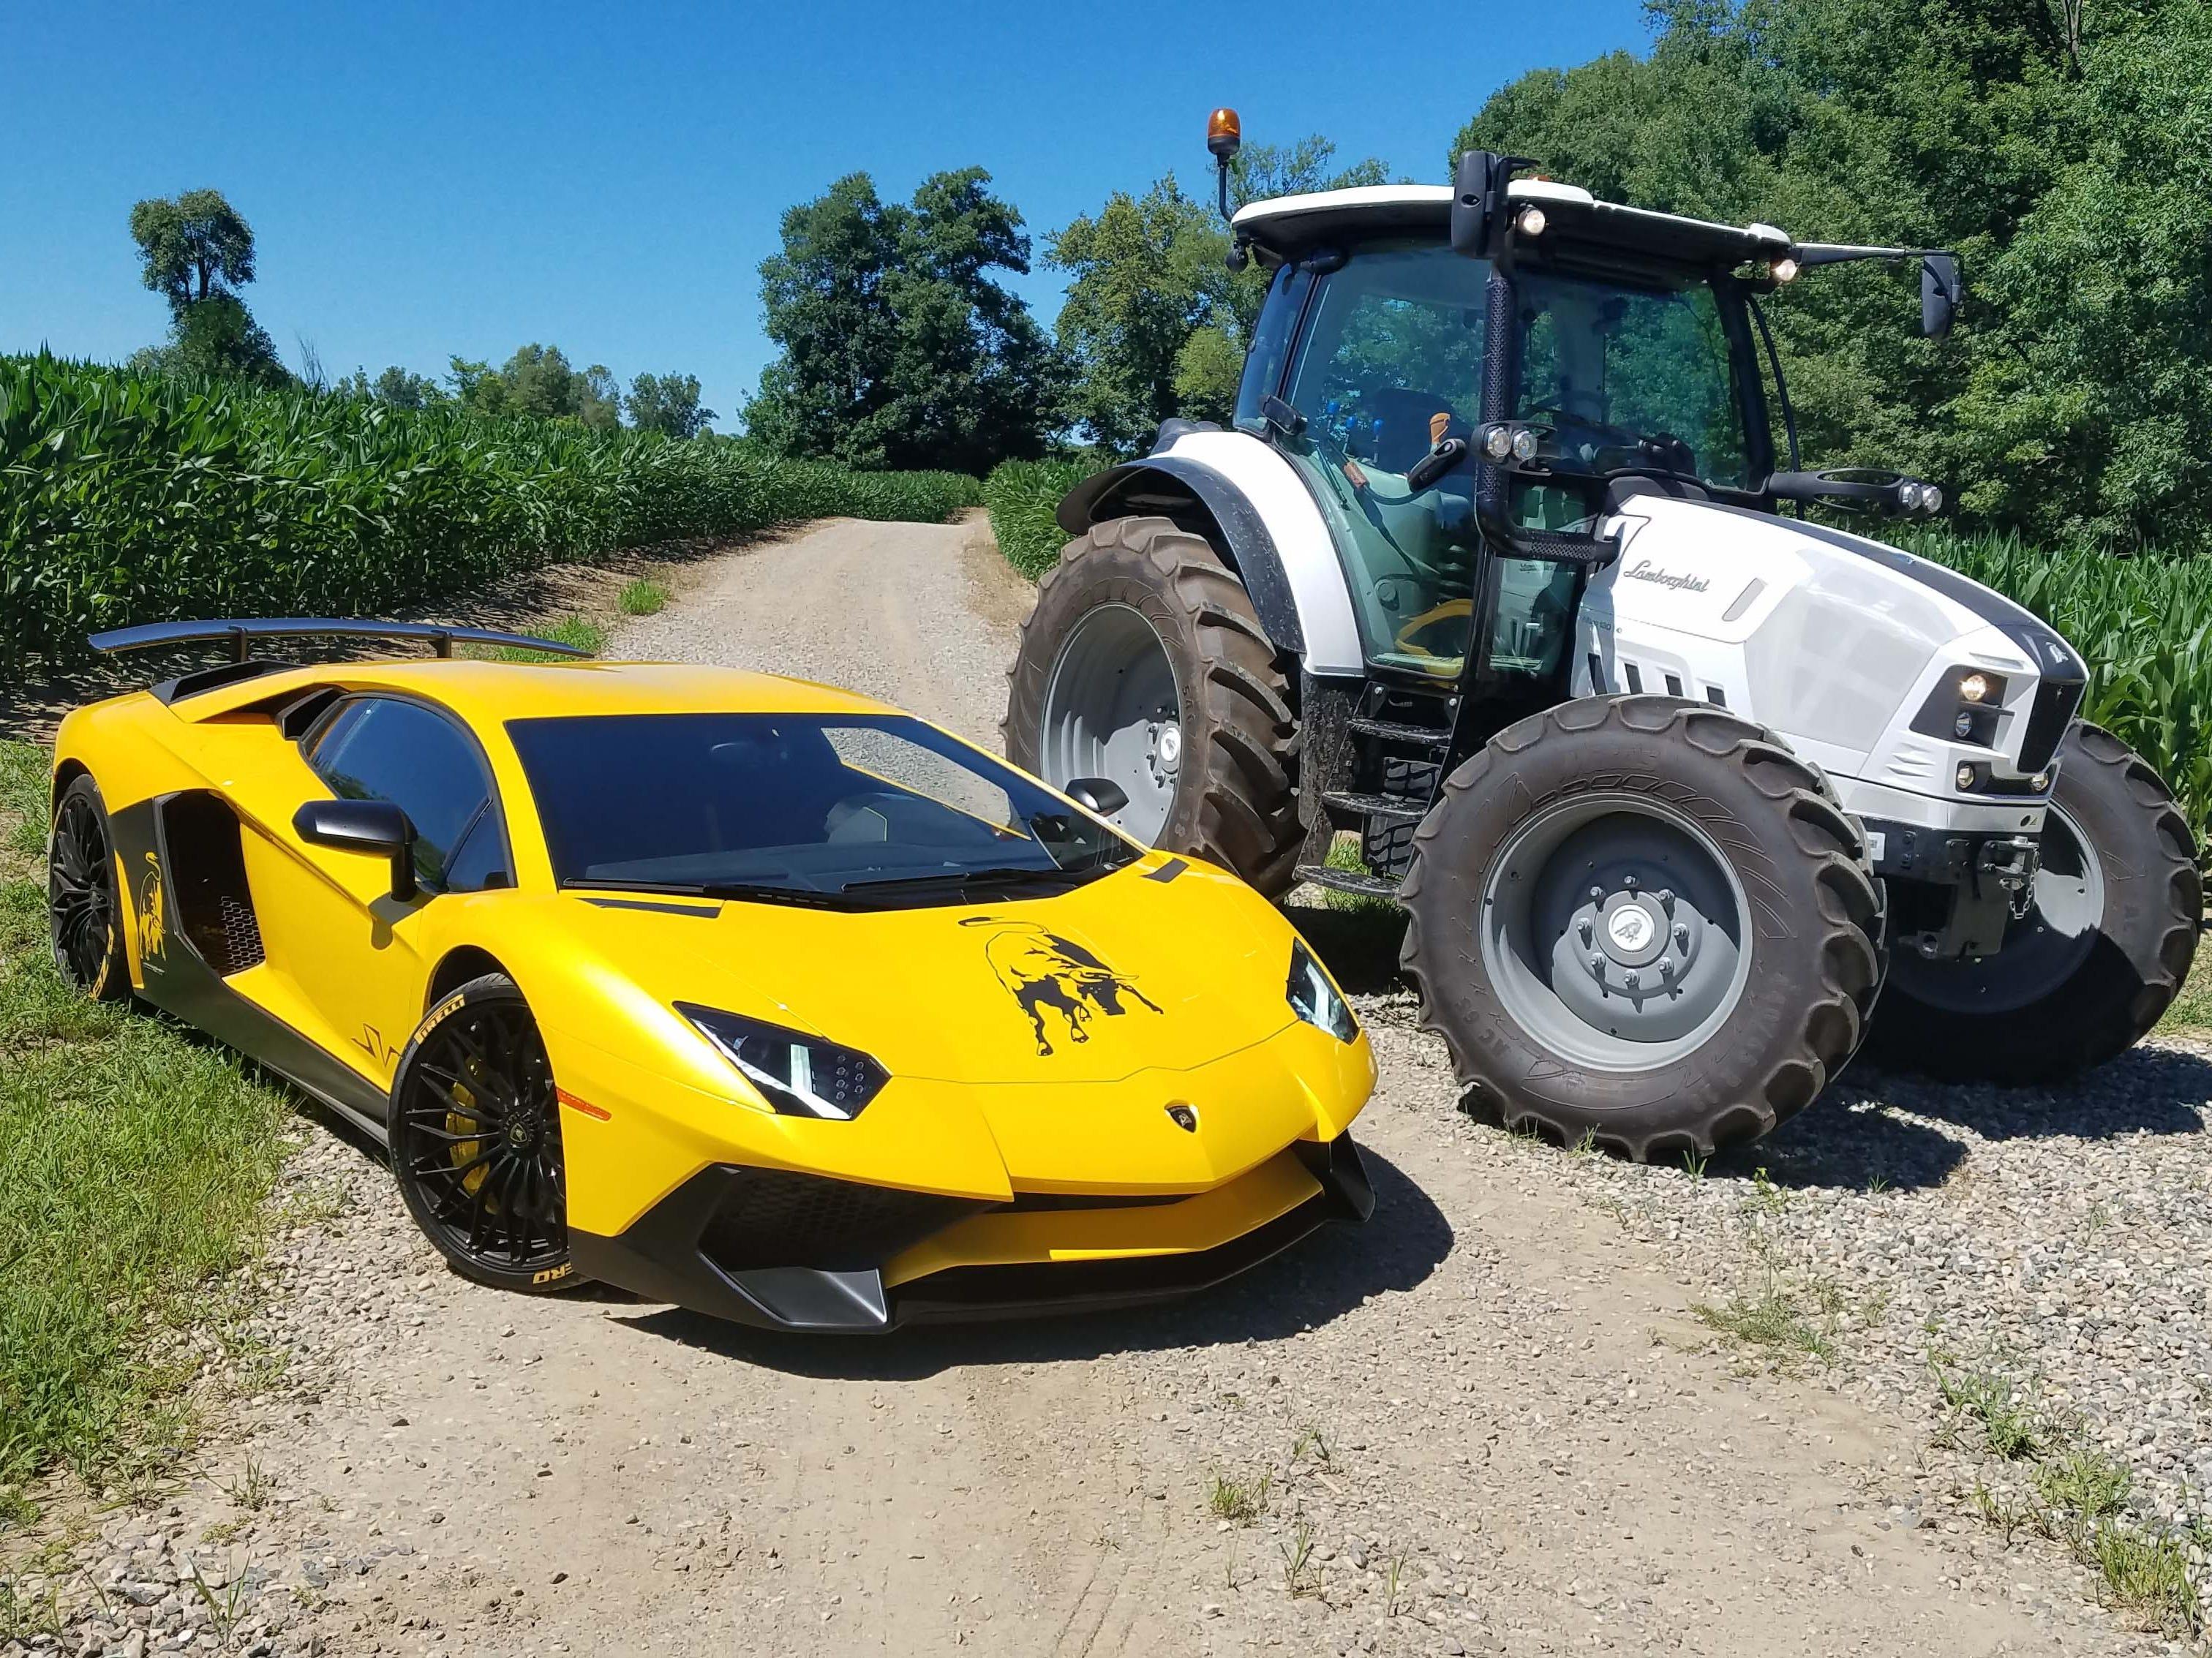 Siblings. The 74-horsepower Lamborghini Aventador supercar and the 127-horse Lamborghini Nitro farm tractor in the cornfields of Metamora.